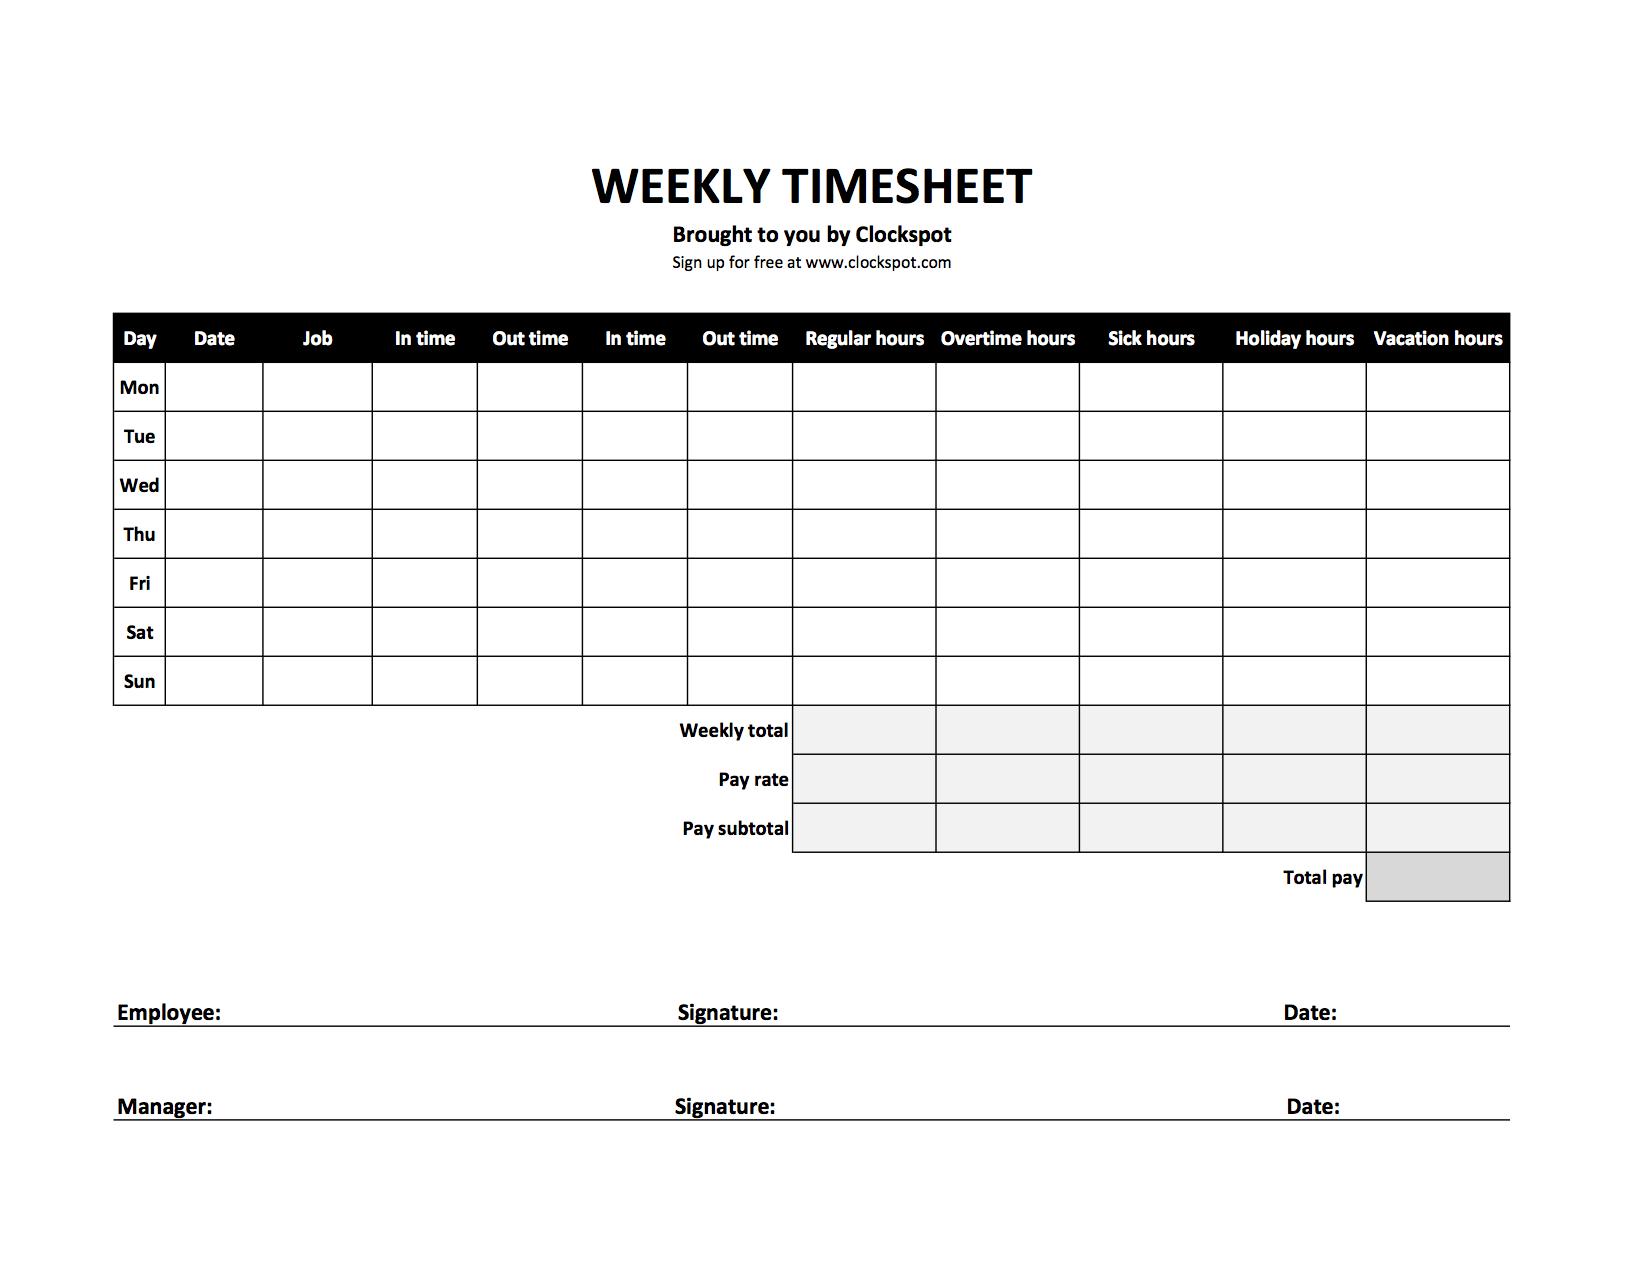 Time Clock Spreadsheet Free Download Inside Time Clock Spreadsheet Template Calculator Free Download Sheet